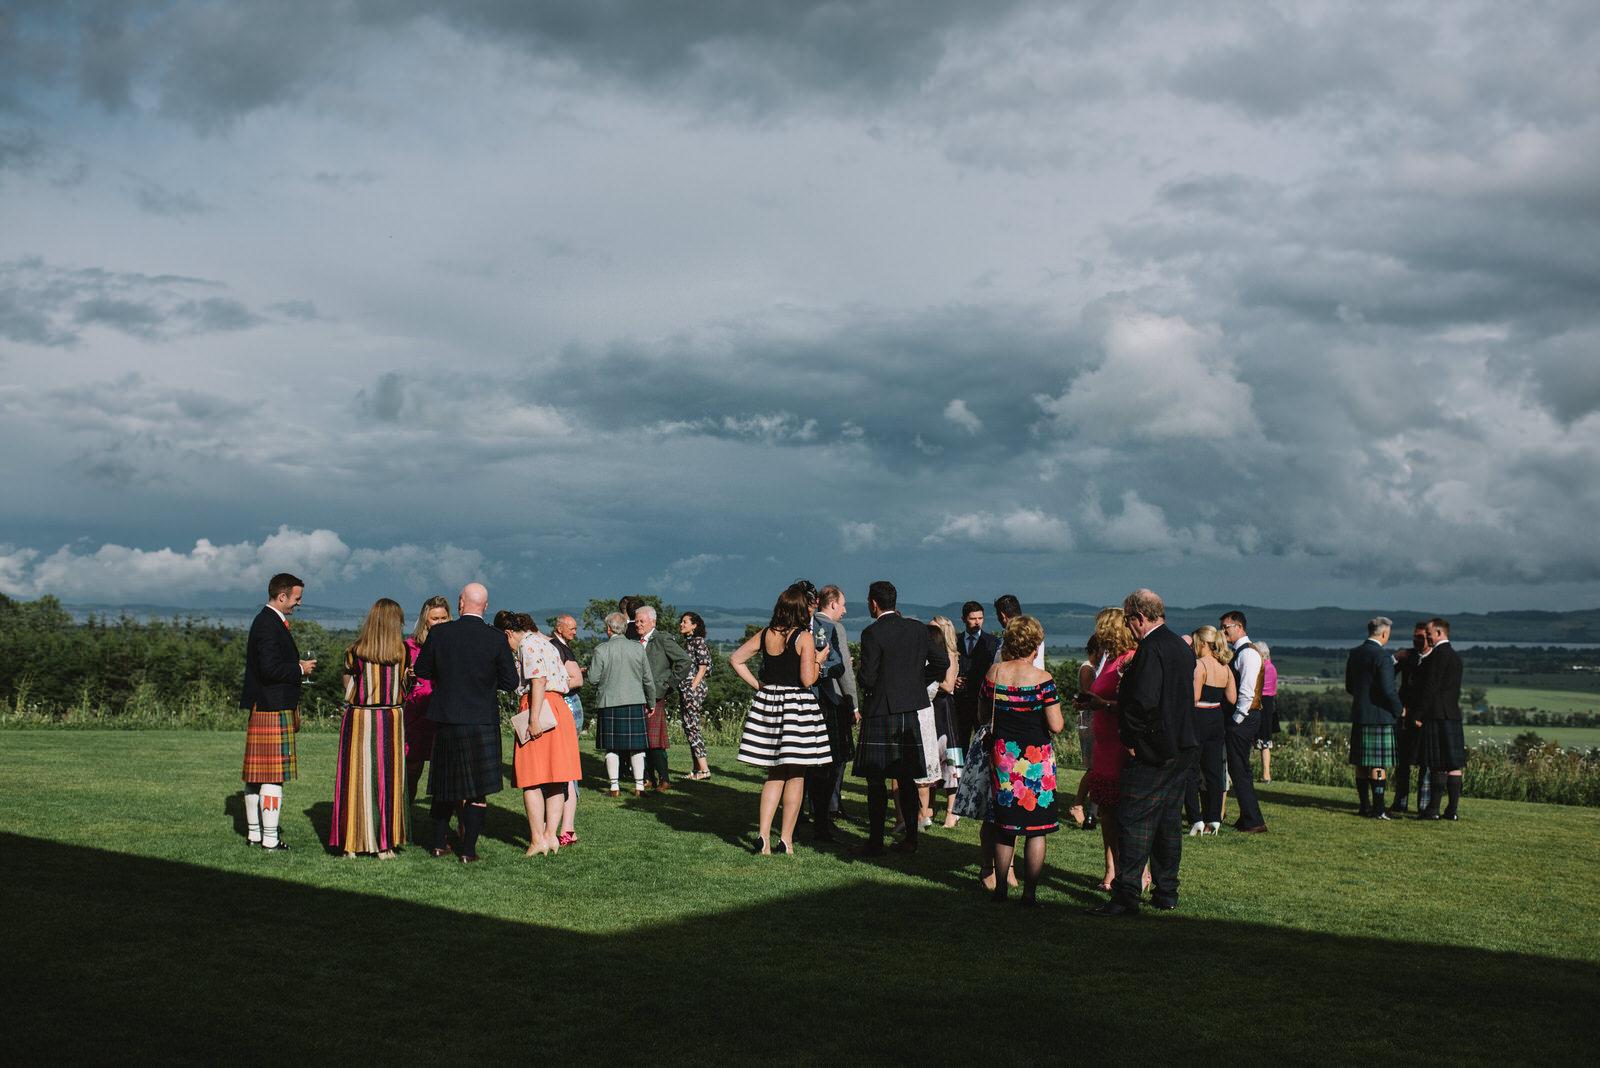 051-GUARDSWELL-FARM-WEDDING-ALTERNATIVE-SCOTTISH-WEDDING-PHOTOGRAPHER-SCOTTISH-WEDDING-DESTINATION-WEDDING-PHOTOGRAPHER.JPG